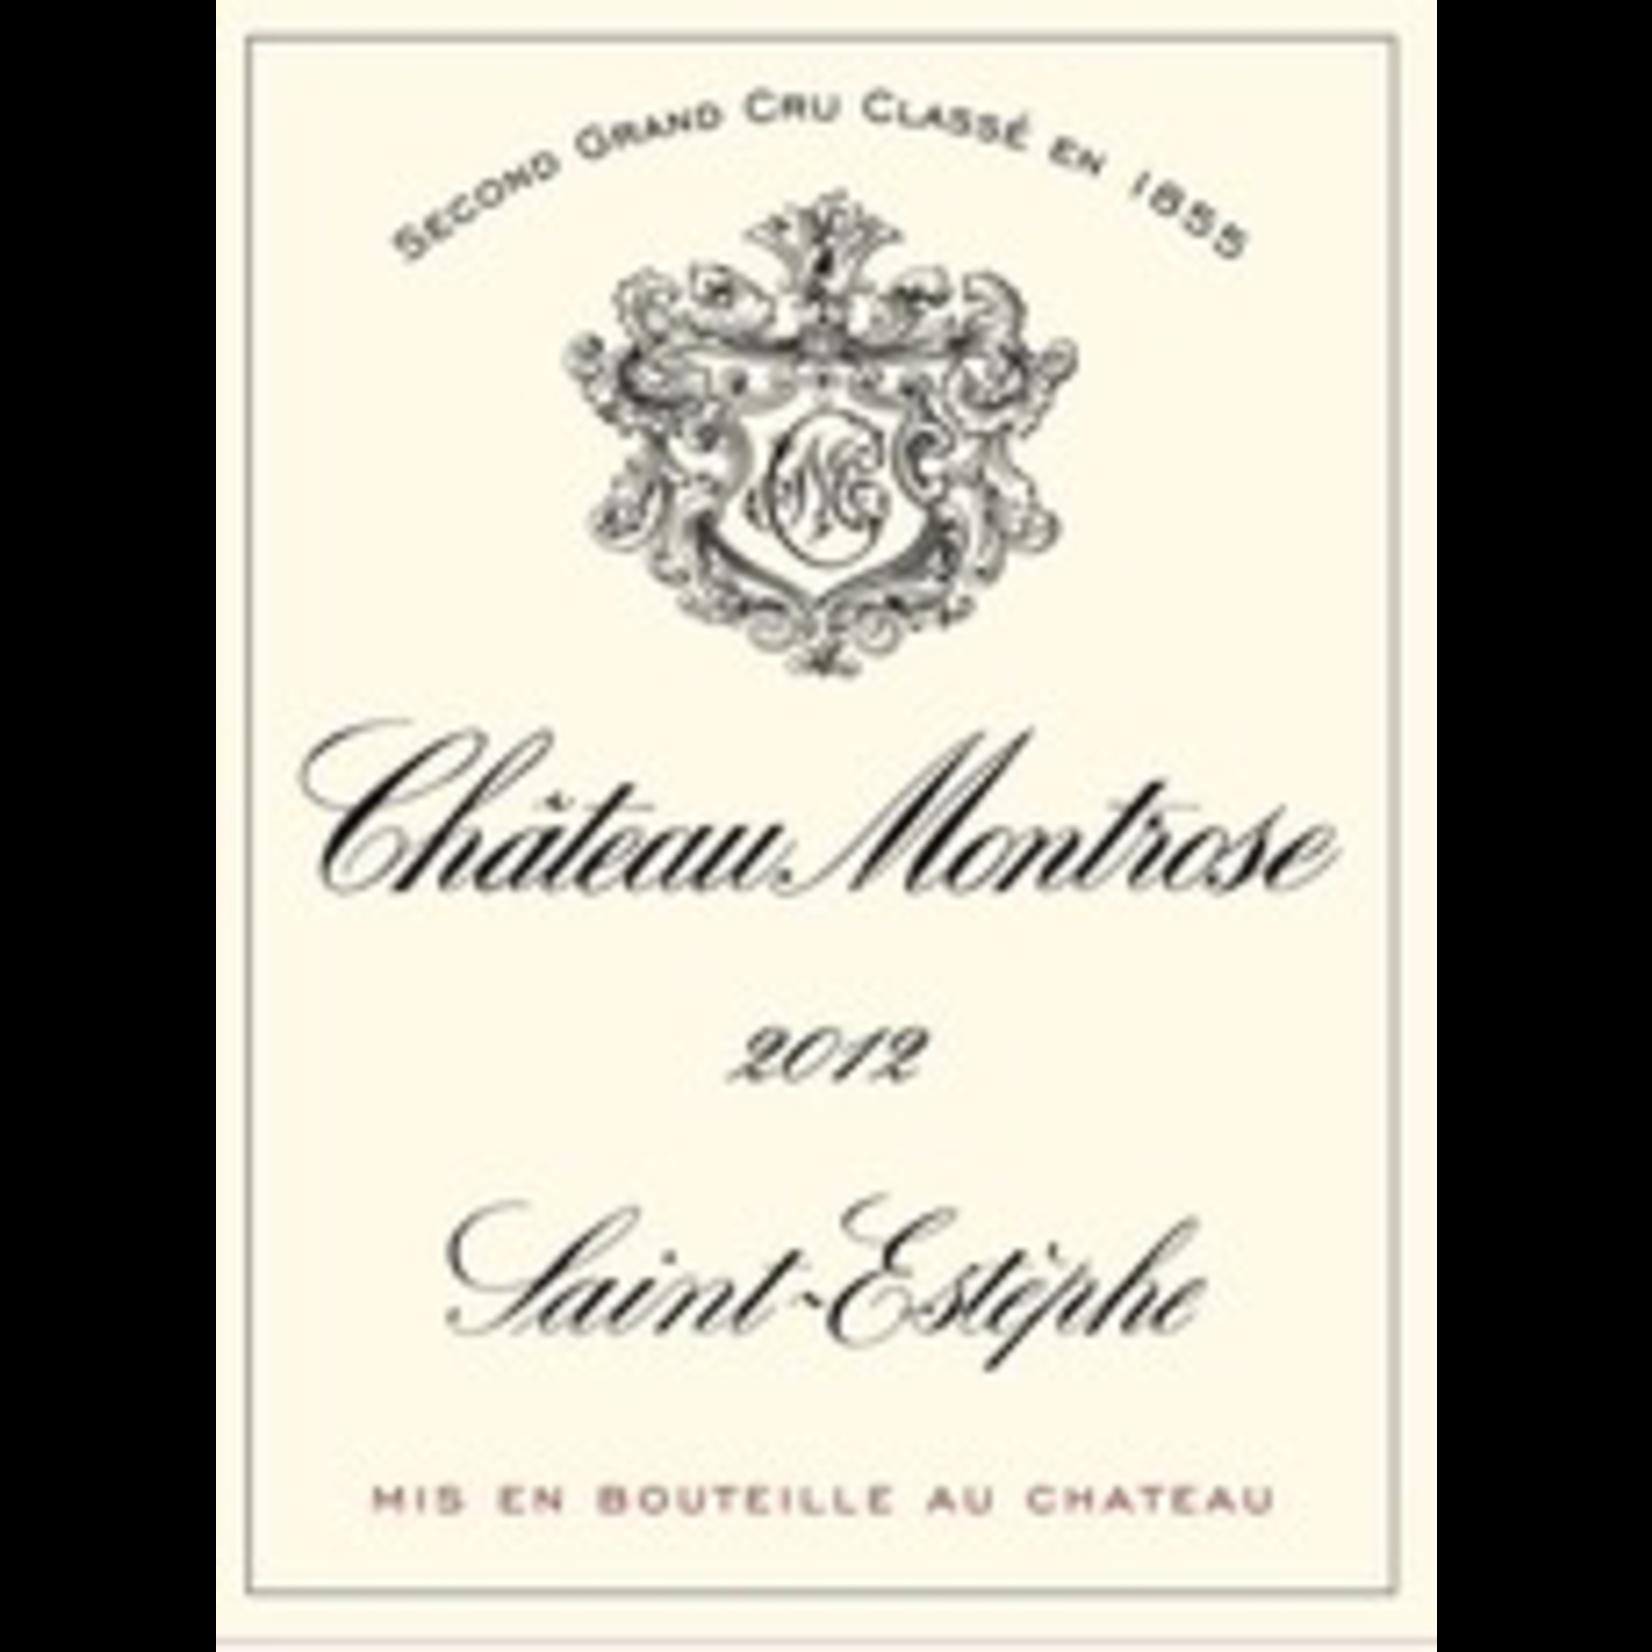 Wine Chateau Montrose 2012